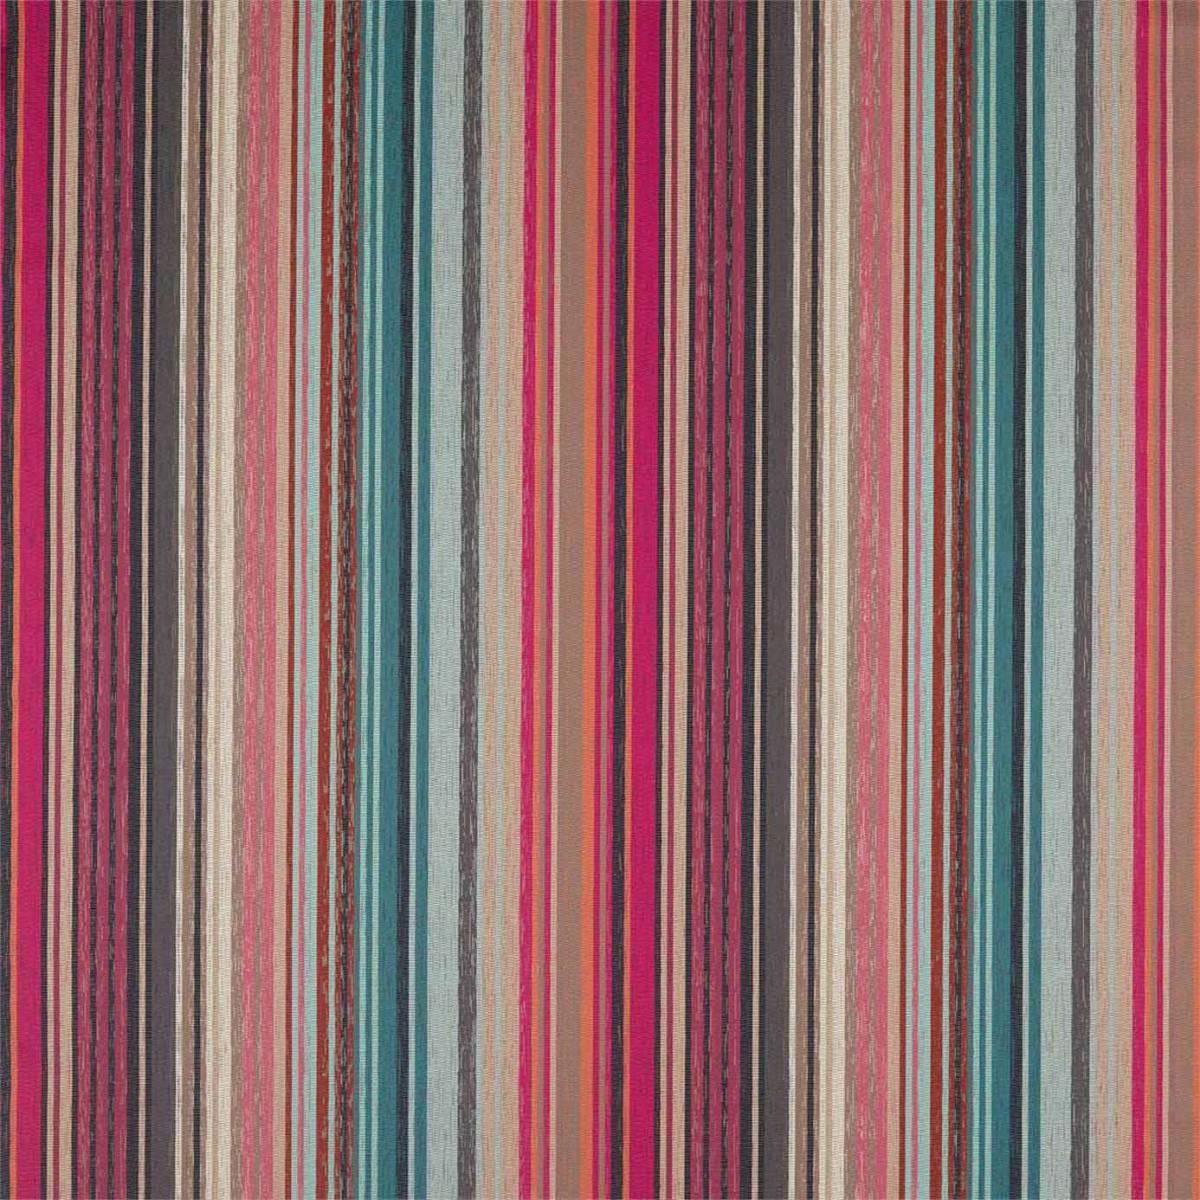 Spectro Stripe Fabric Cerise Marine Coral 132826